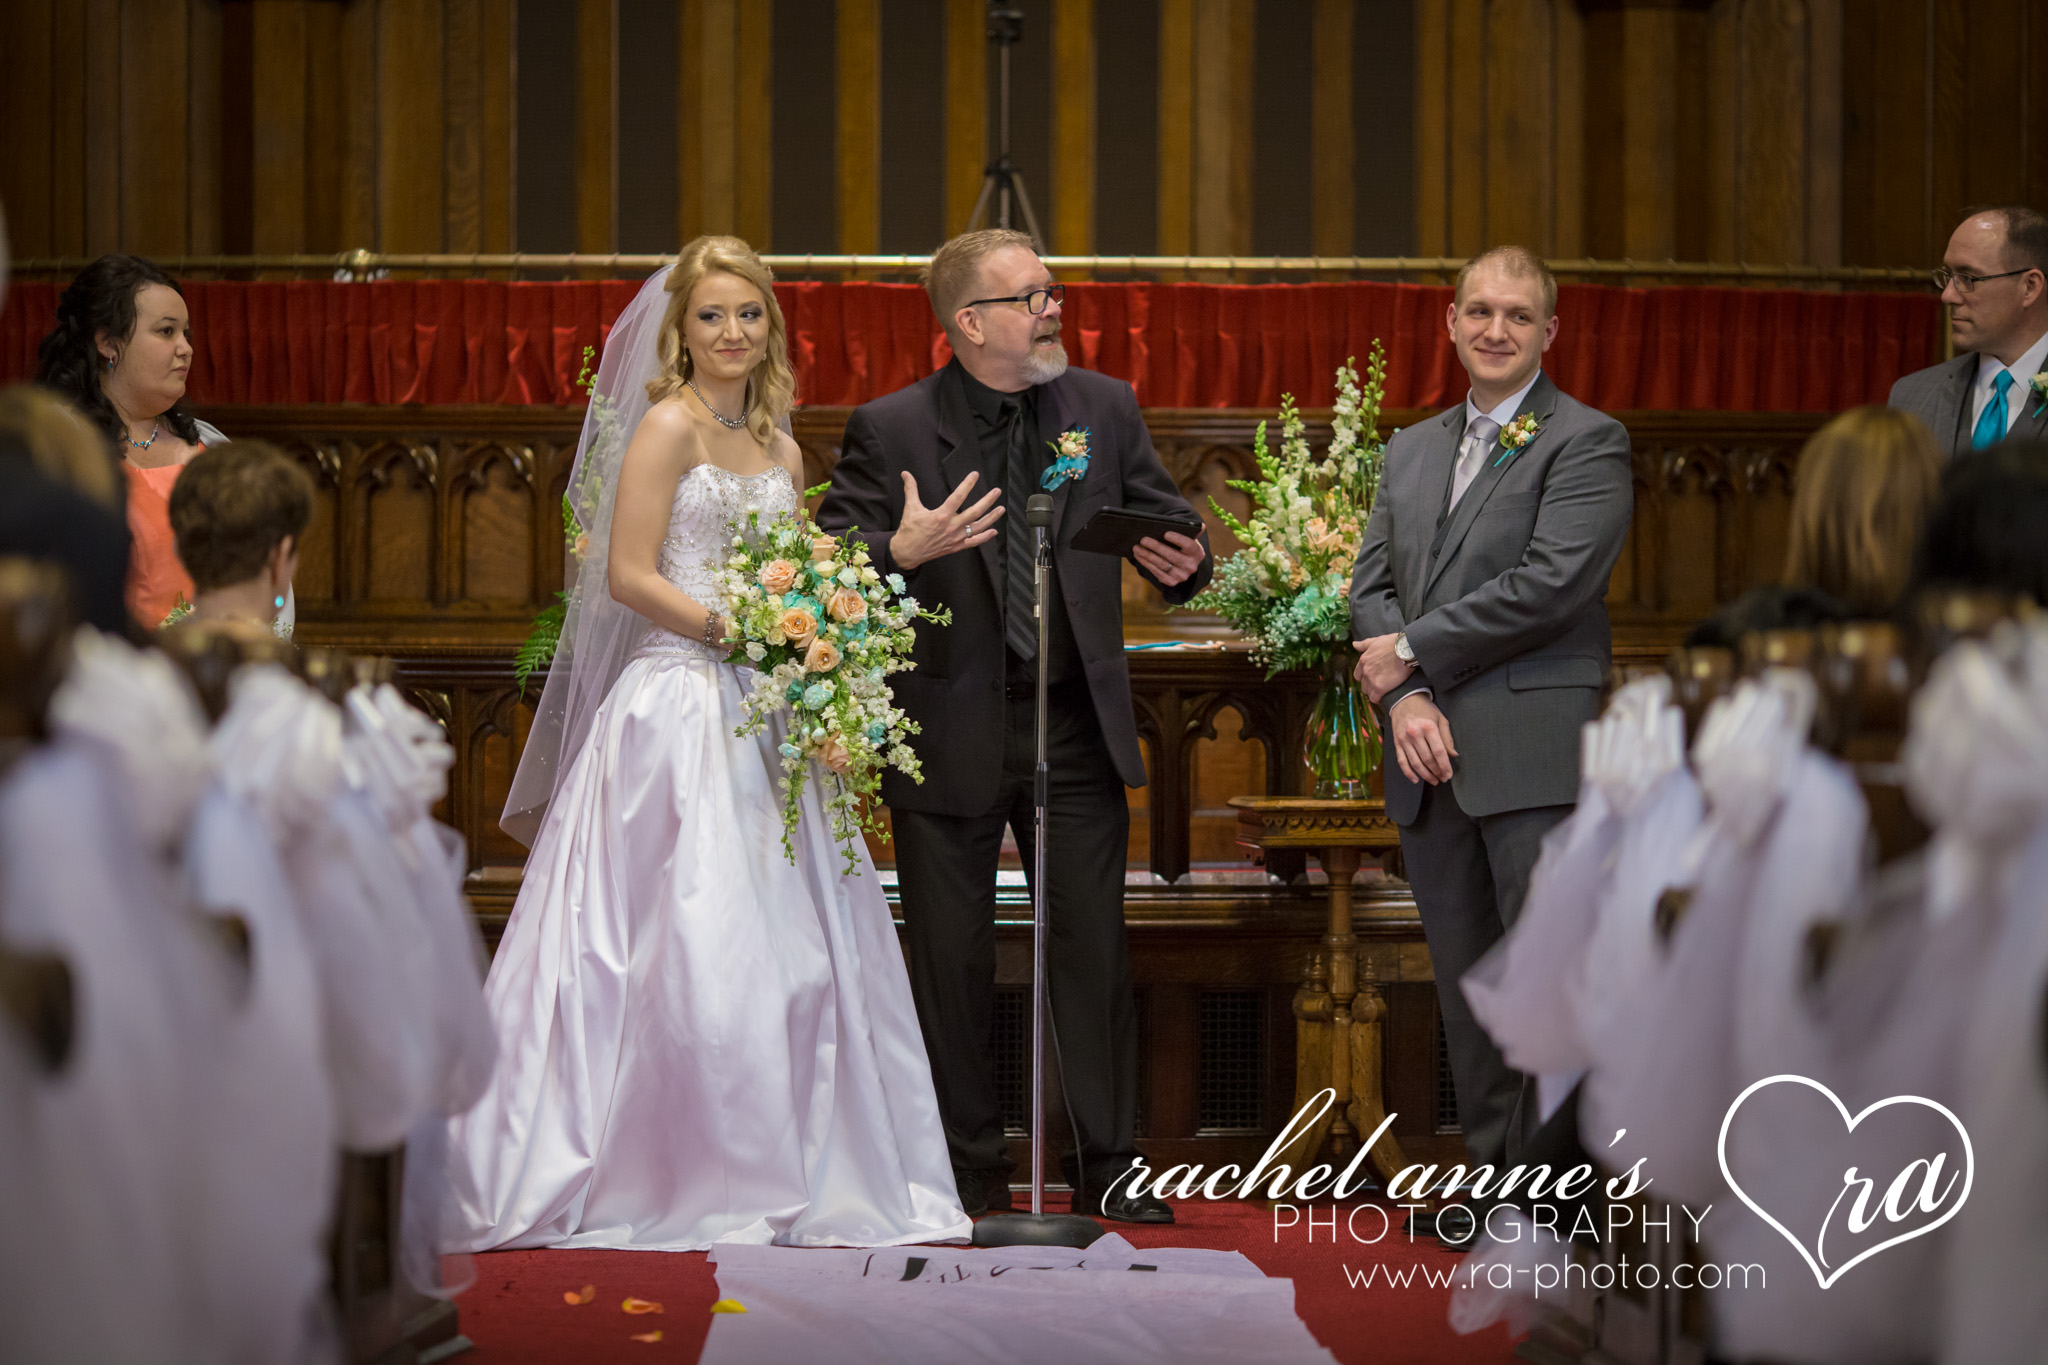 023-JKS-WEDDINGS-THE-FRANKLIN-PA.jpg